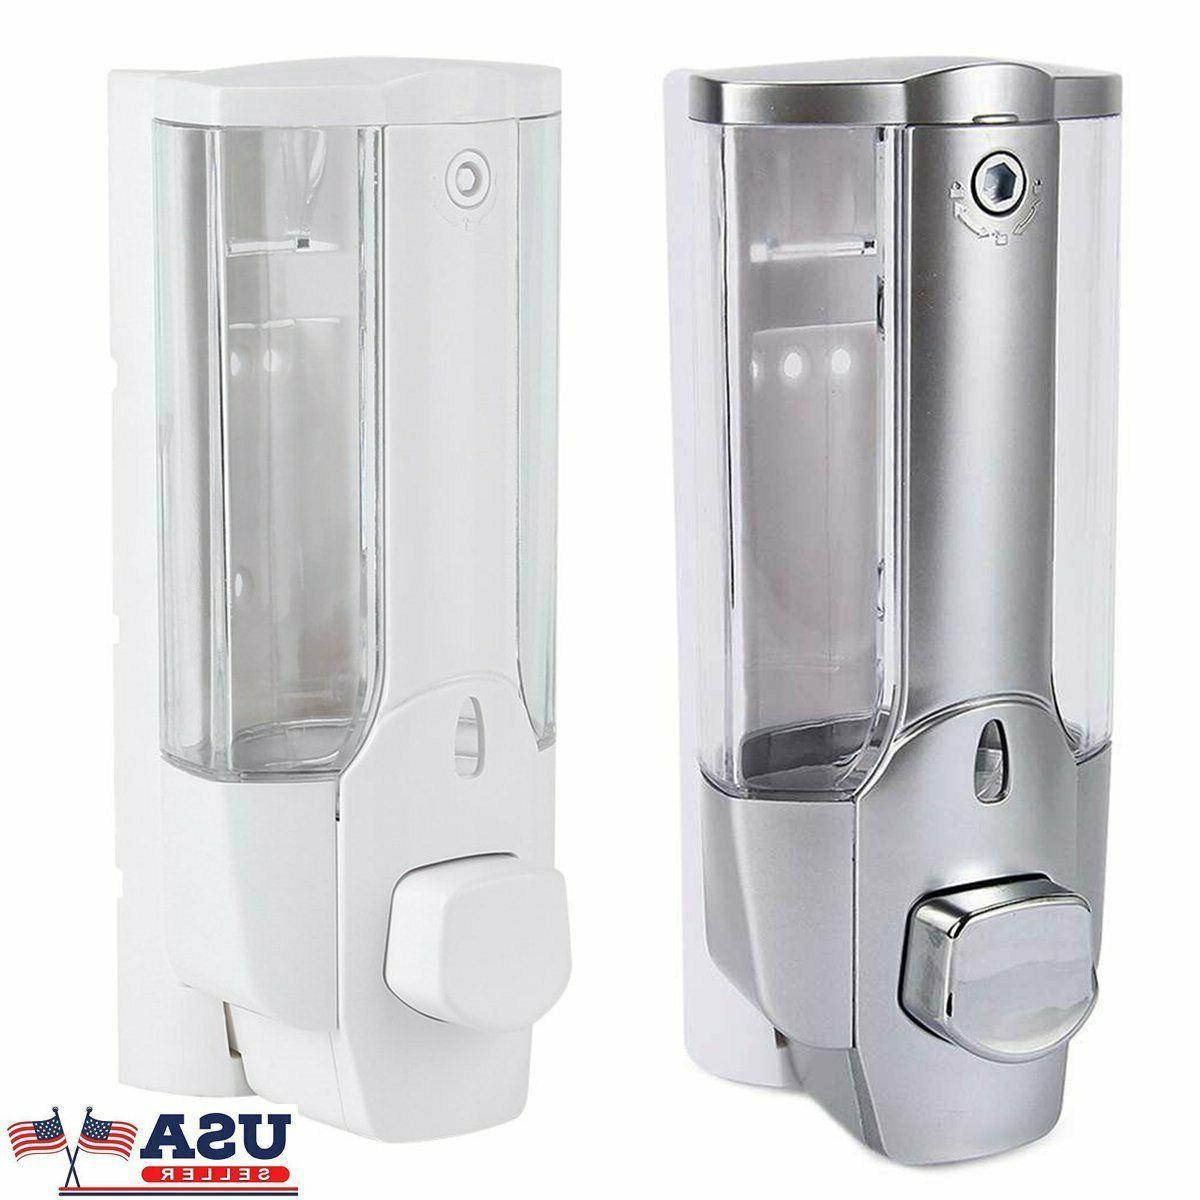 Wall Mounted Liquid Soap Dispenser Bathroom Hand Sanitizer S